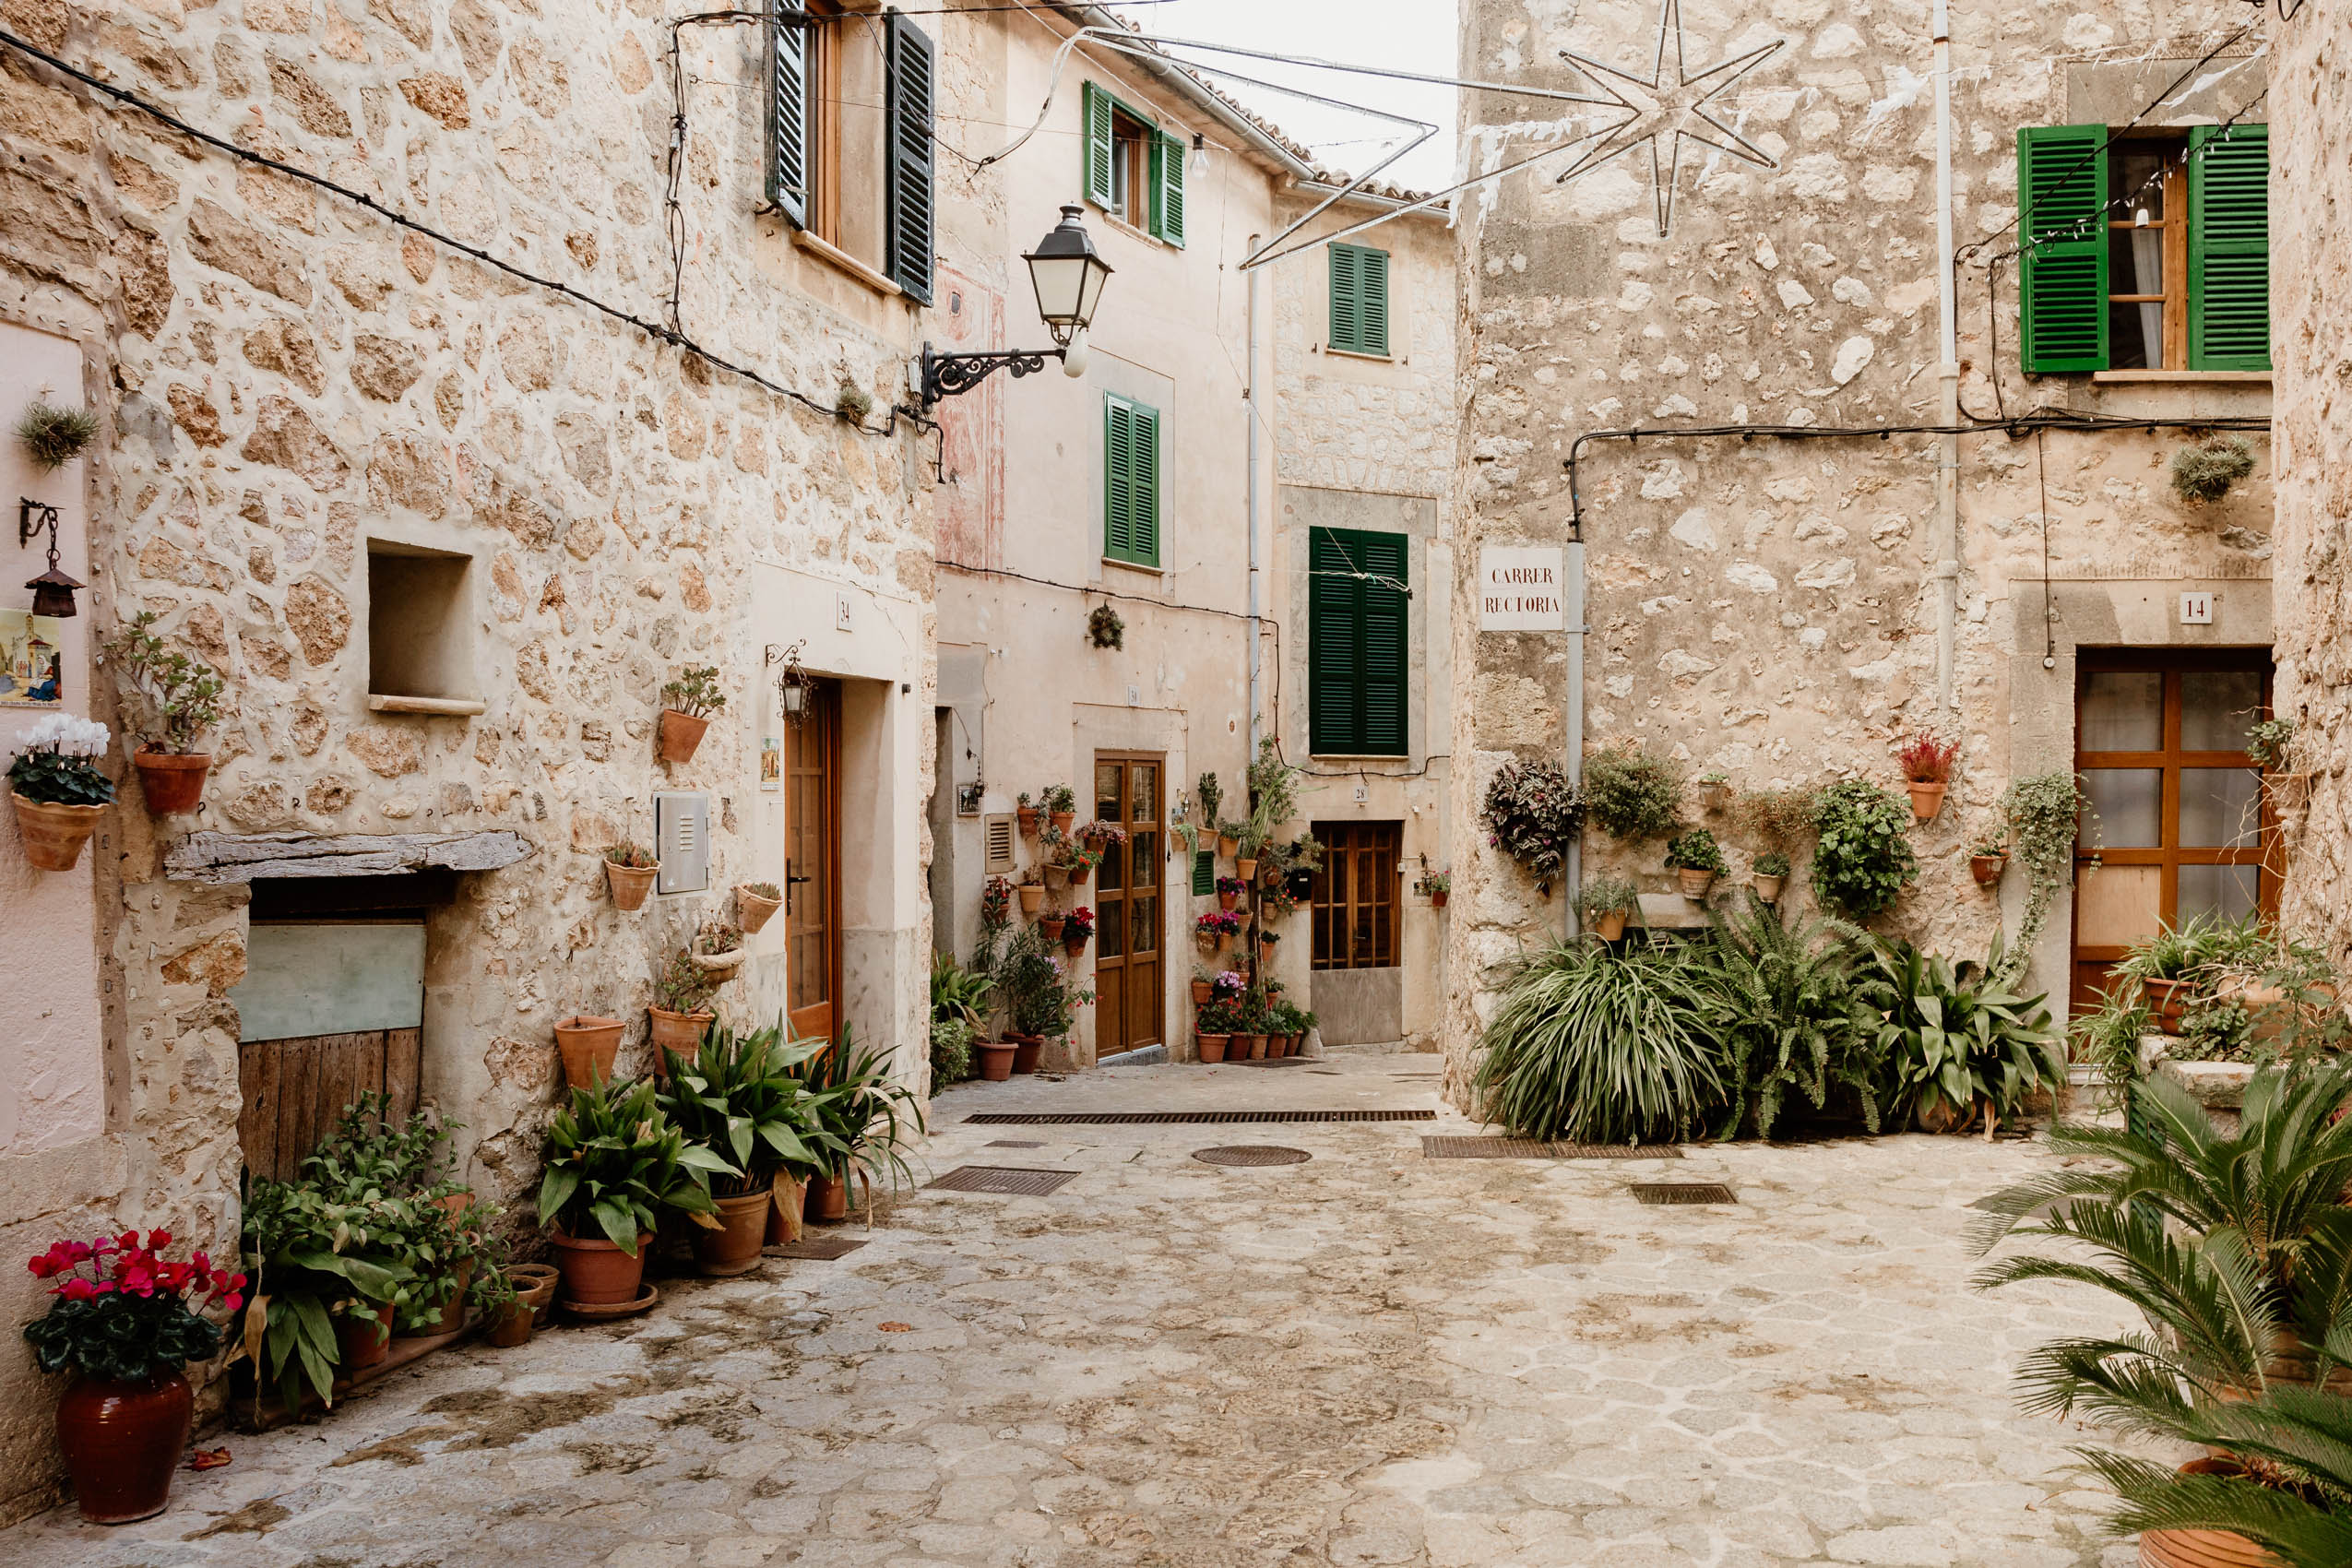 Mallorca, part 2- Soller, Port de Soller, Deia, Valdemossa